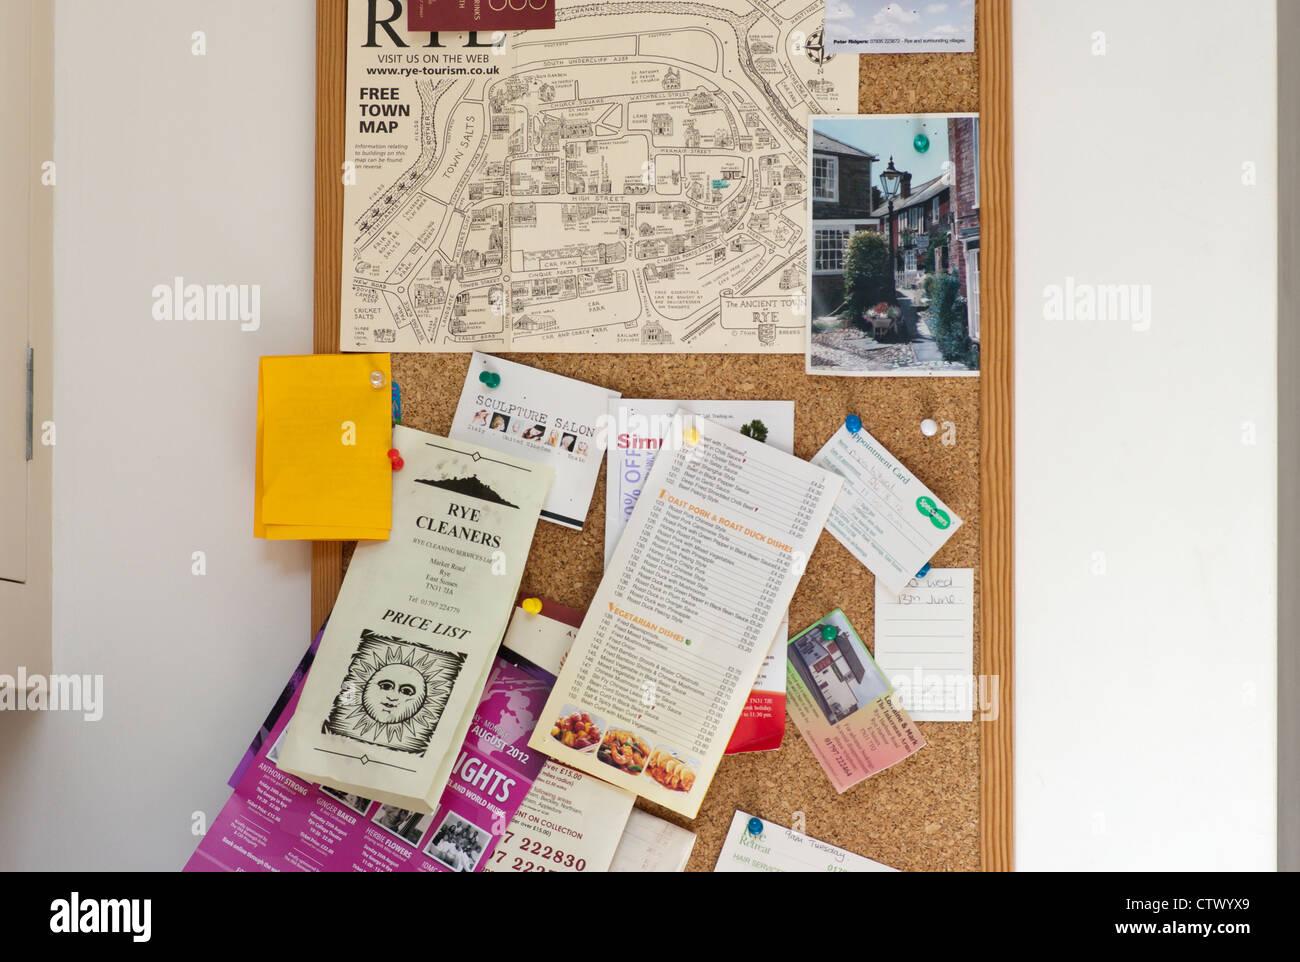 Kitchen Cork Noticeboard Corkboard - Stock Image